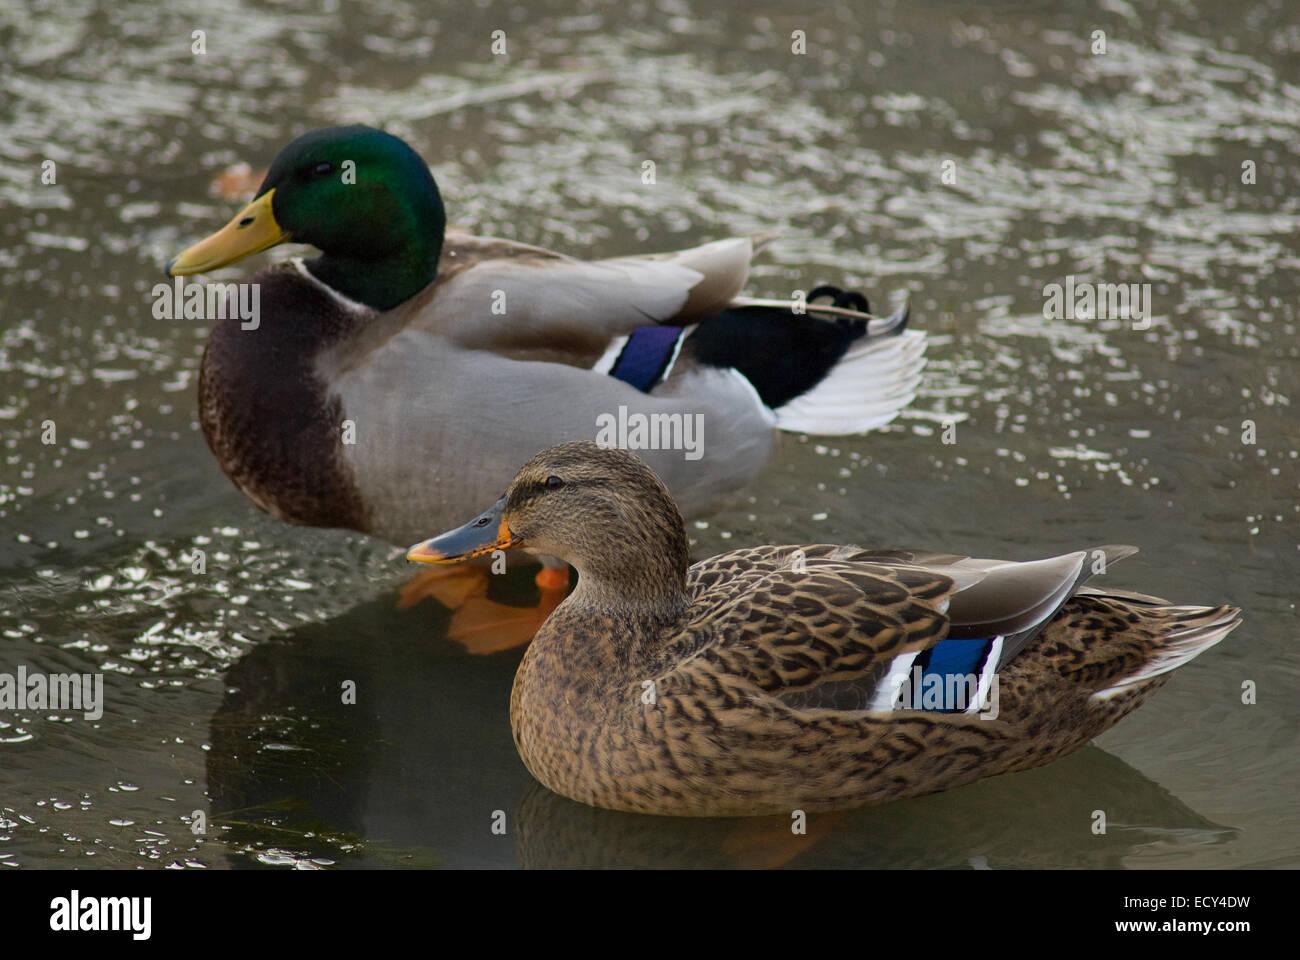 Male and female of mallard or wild duck, Anas platyrhynchos, Anatidae, Paterno Lake, Rieti, Lazio, Italy - Stock Image